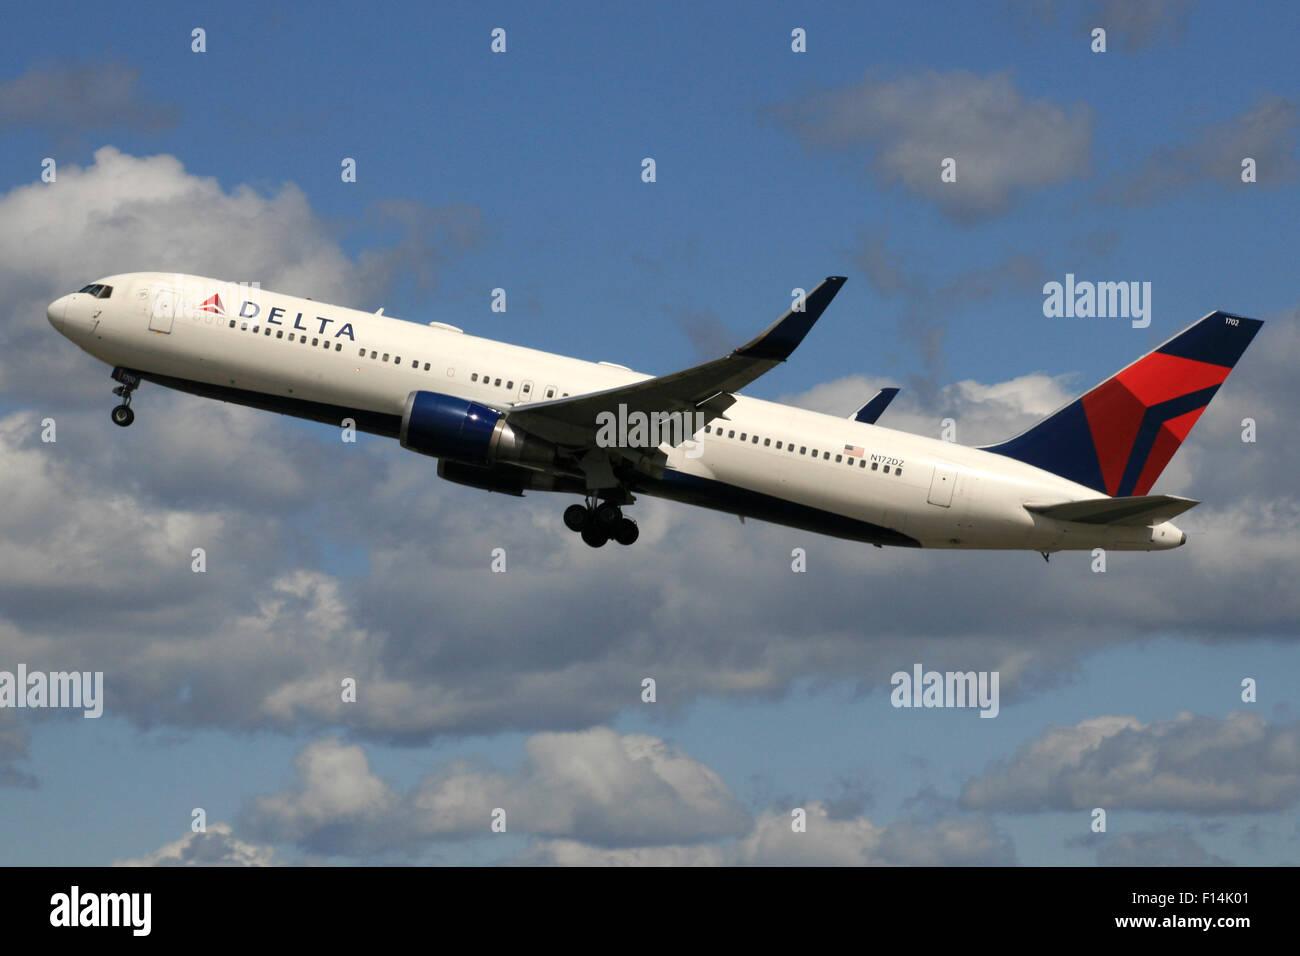 DELTA 767 3200 WINGLETS 767W - Stock Image